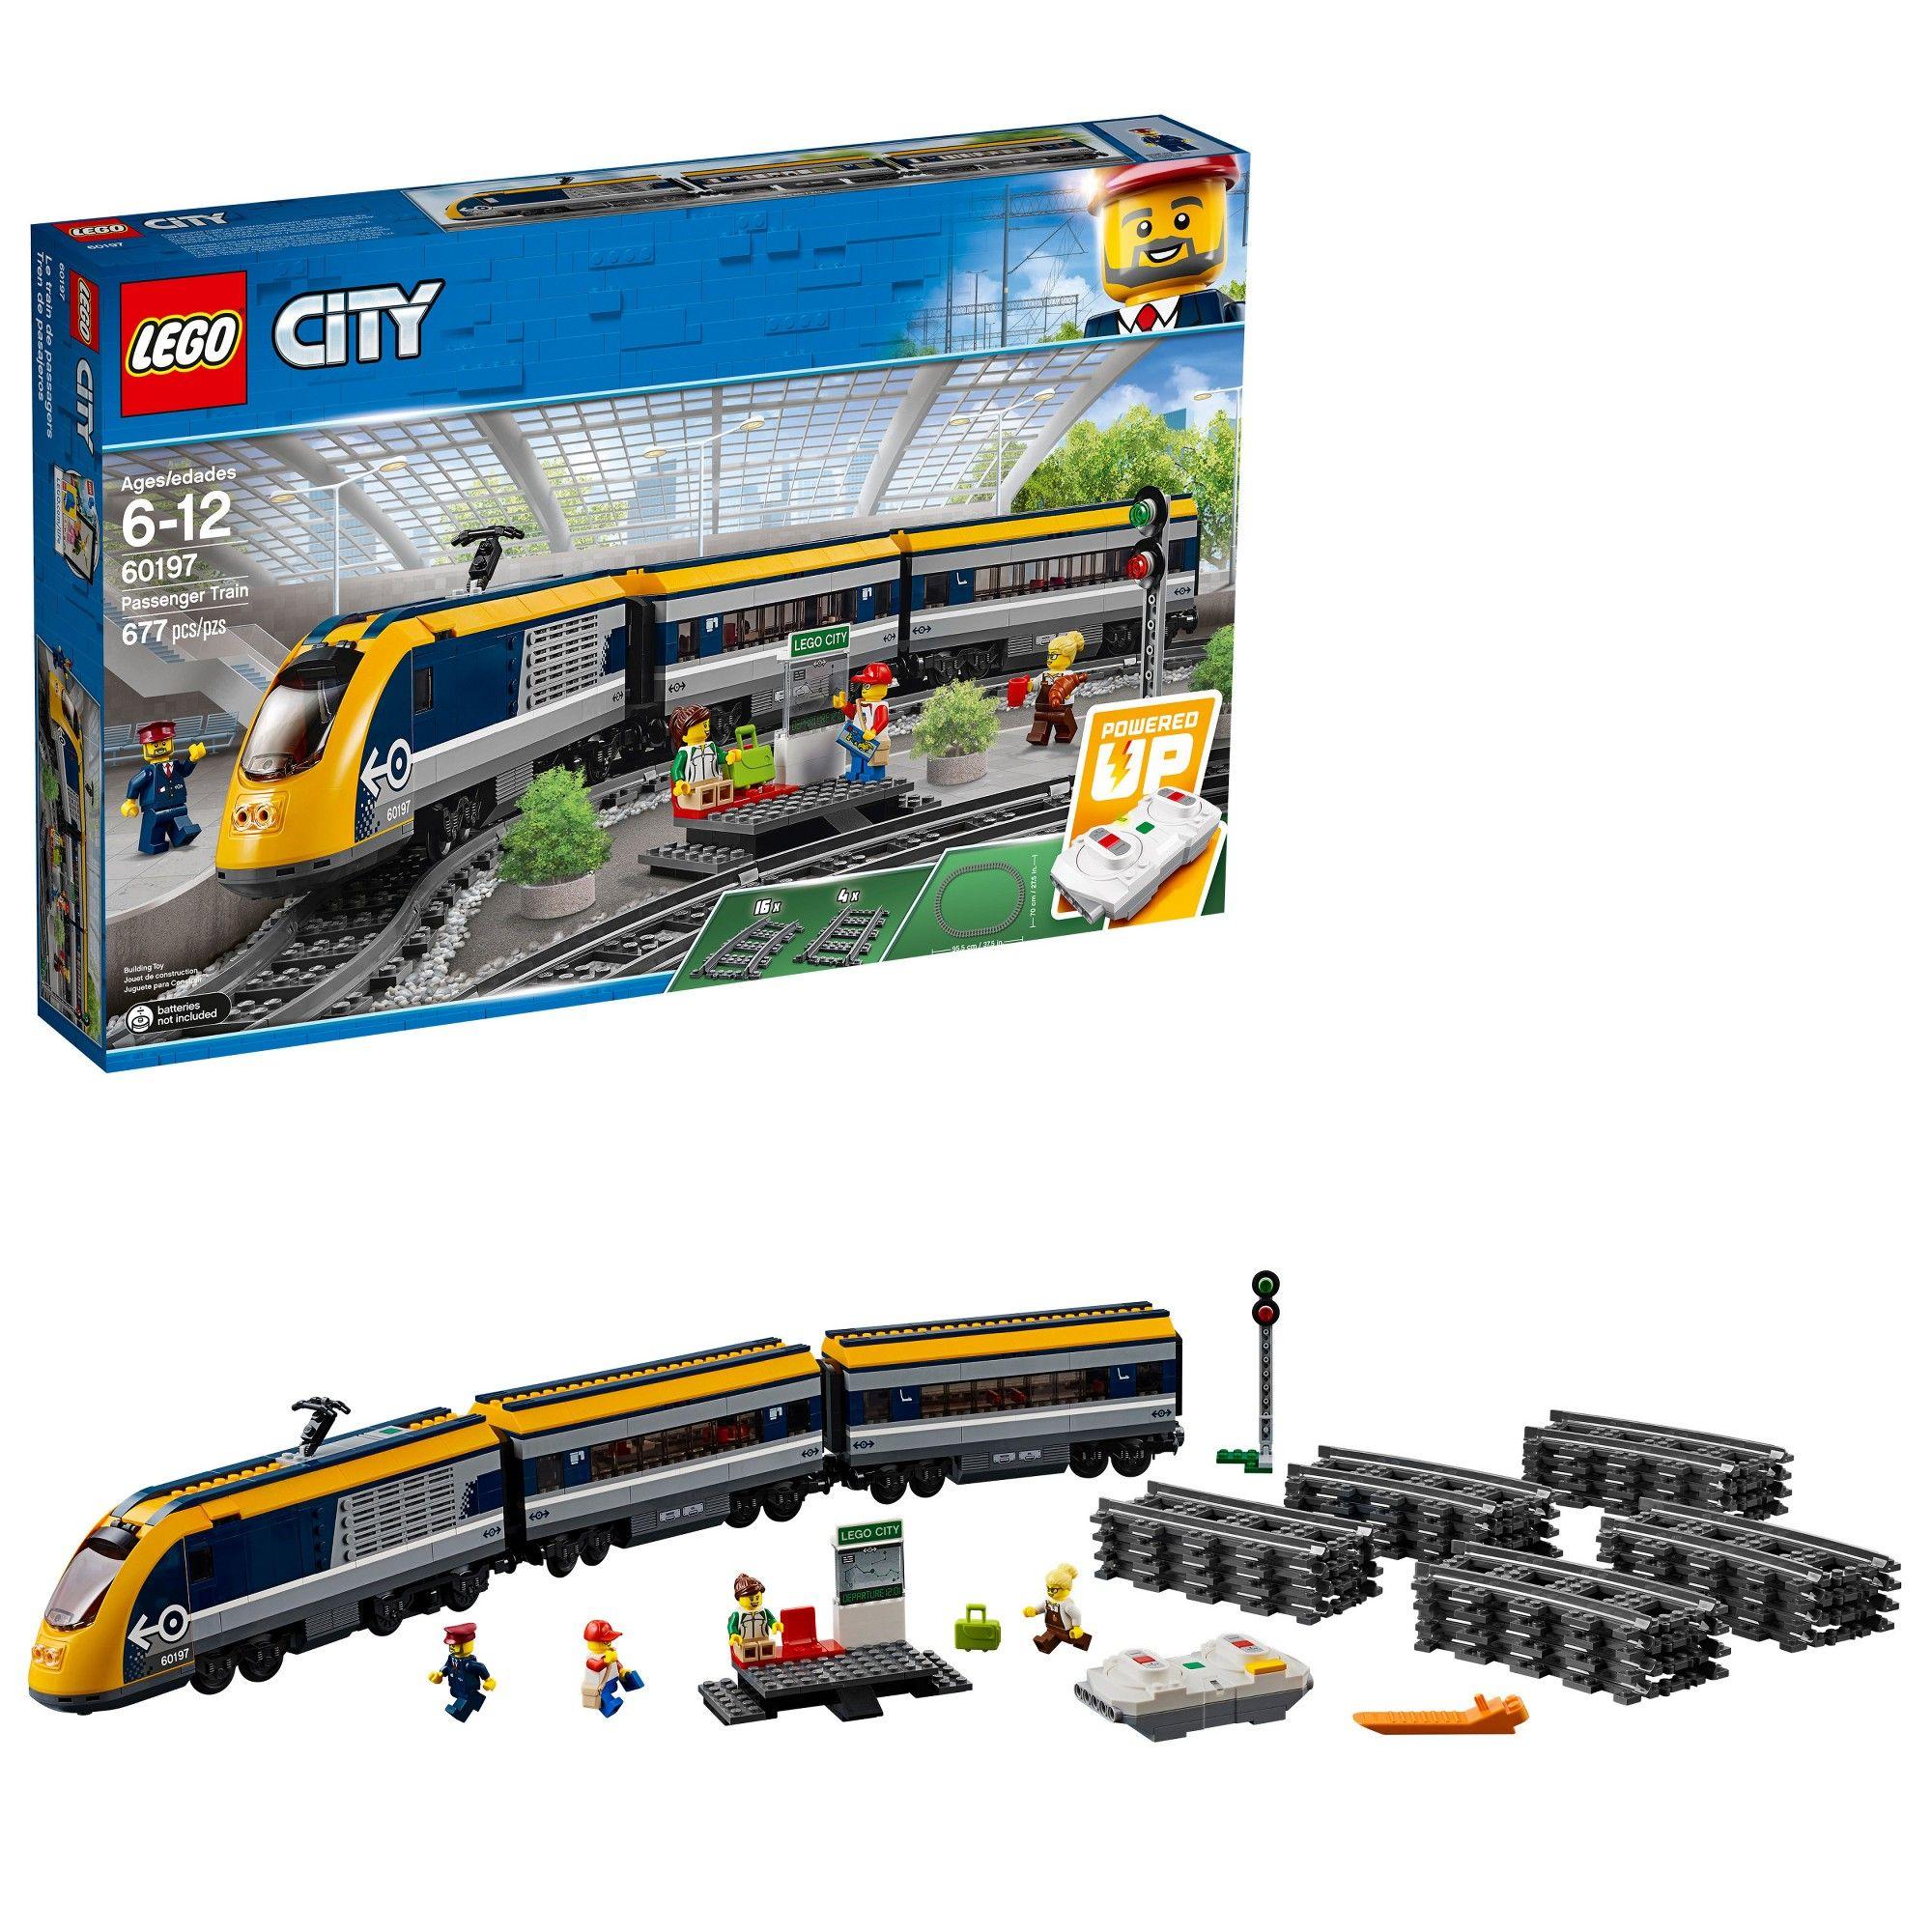 Lego City Passenger Train 60197 Lego City Lego City Train Lego Trains